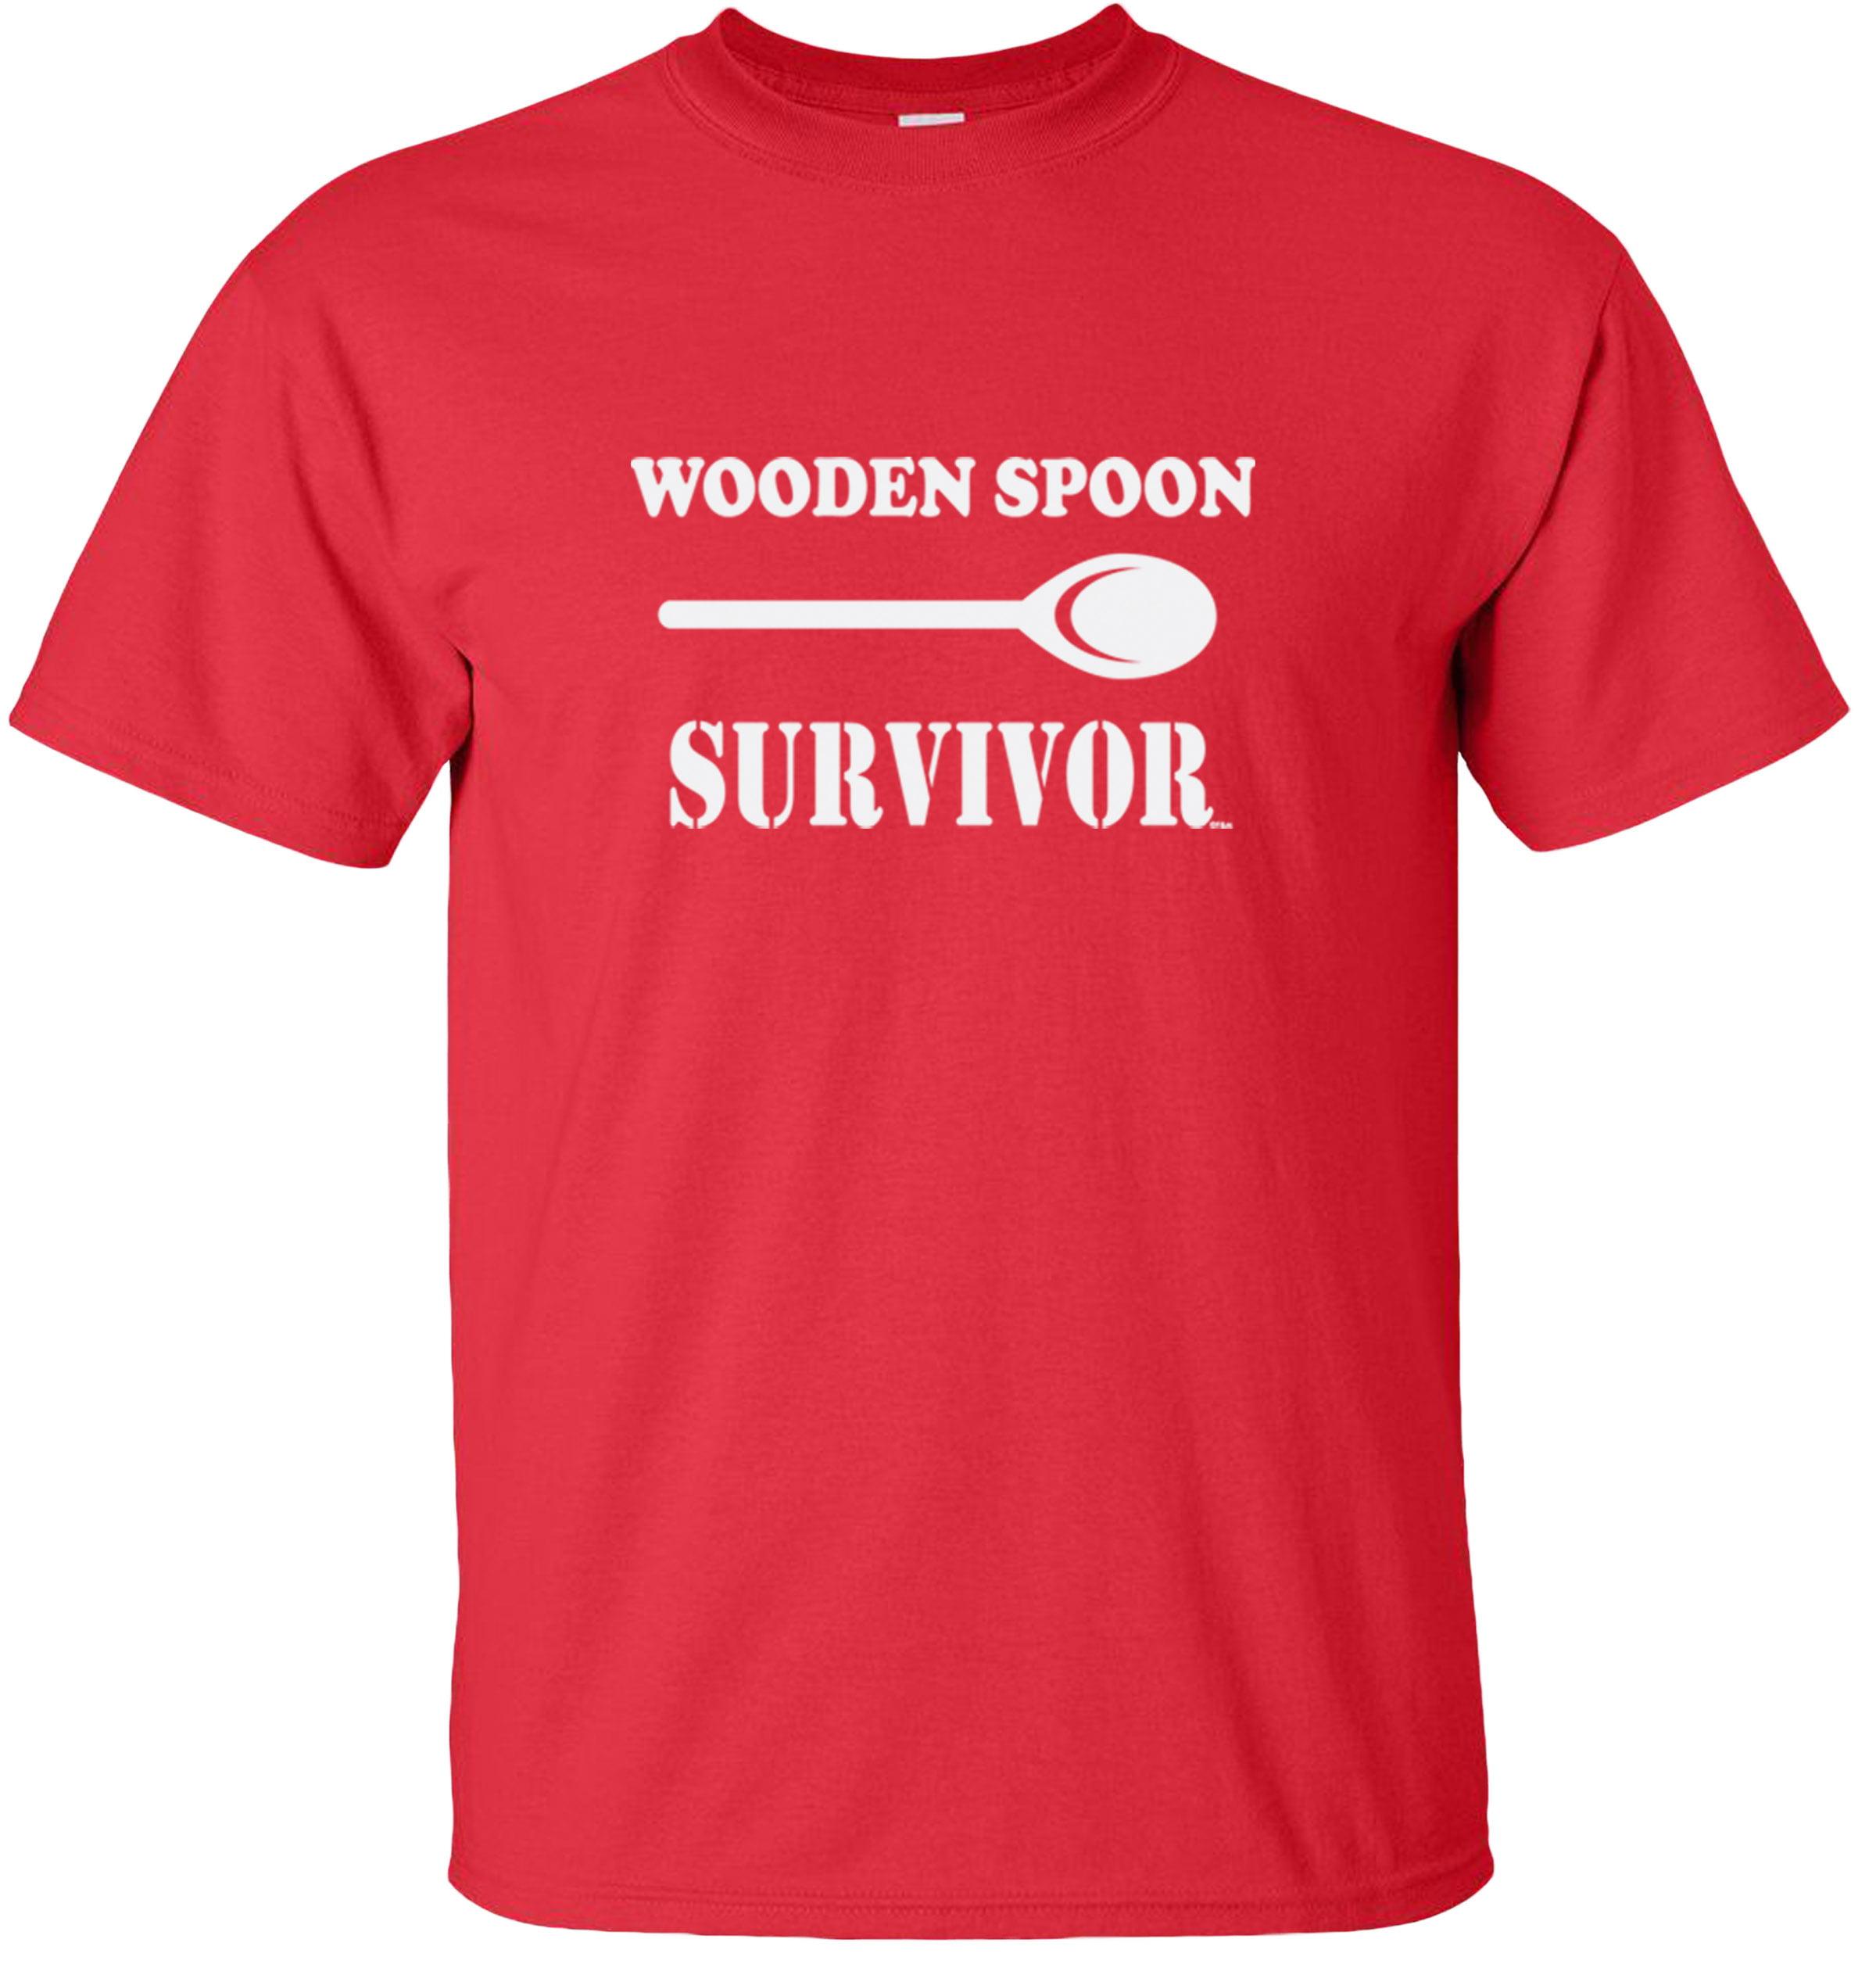 Wooden Spoon Survivor Unisex T-Shirt Funny Adult shirt